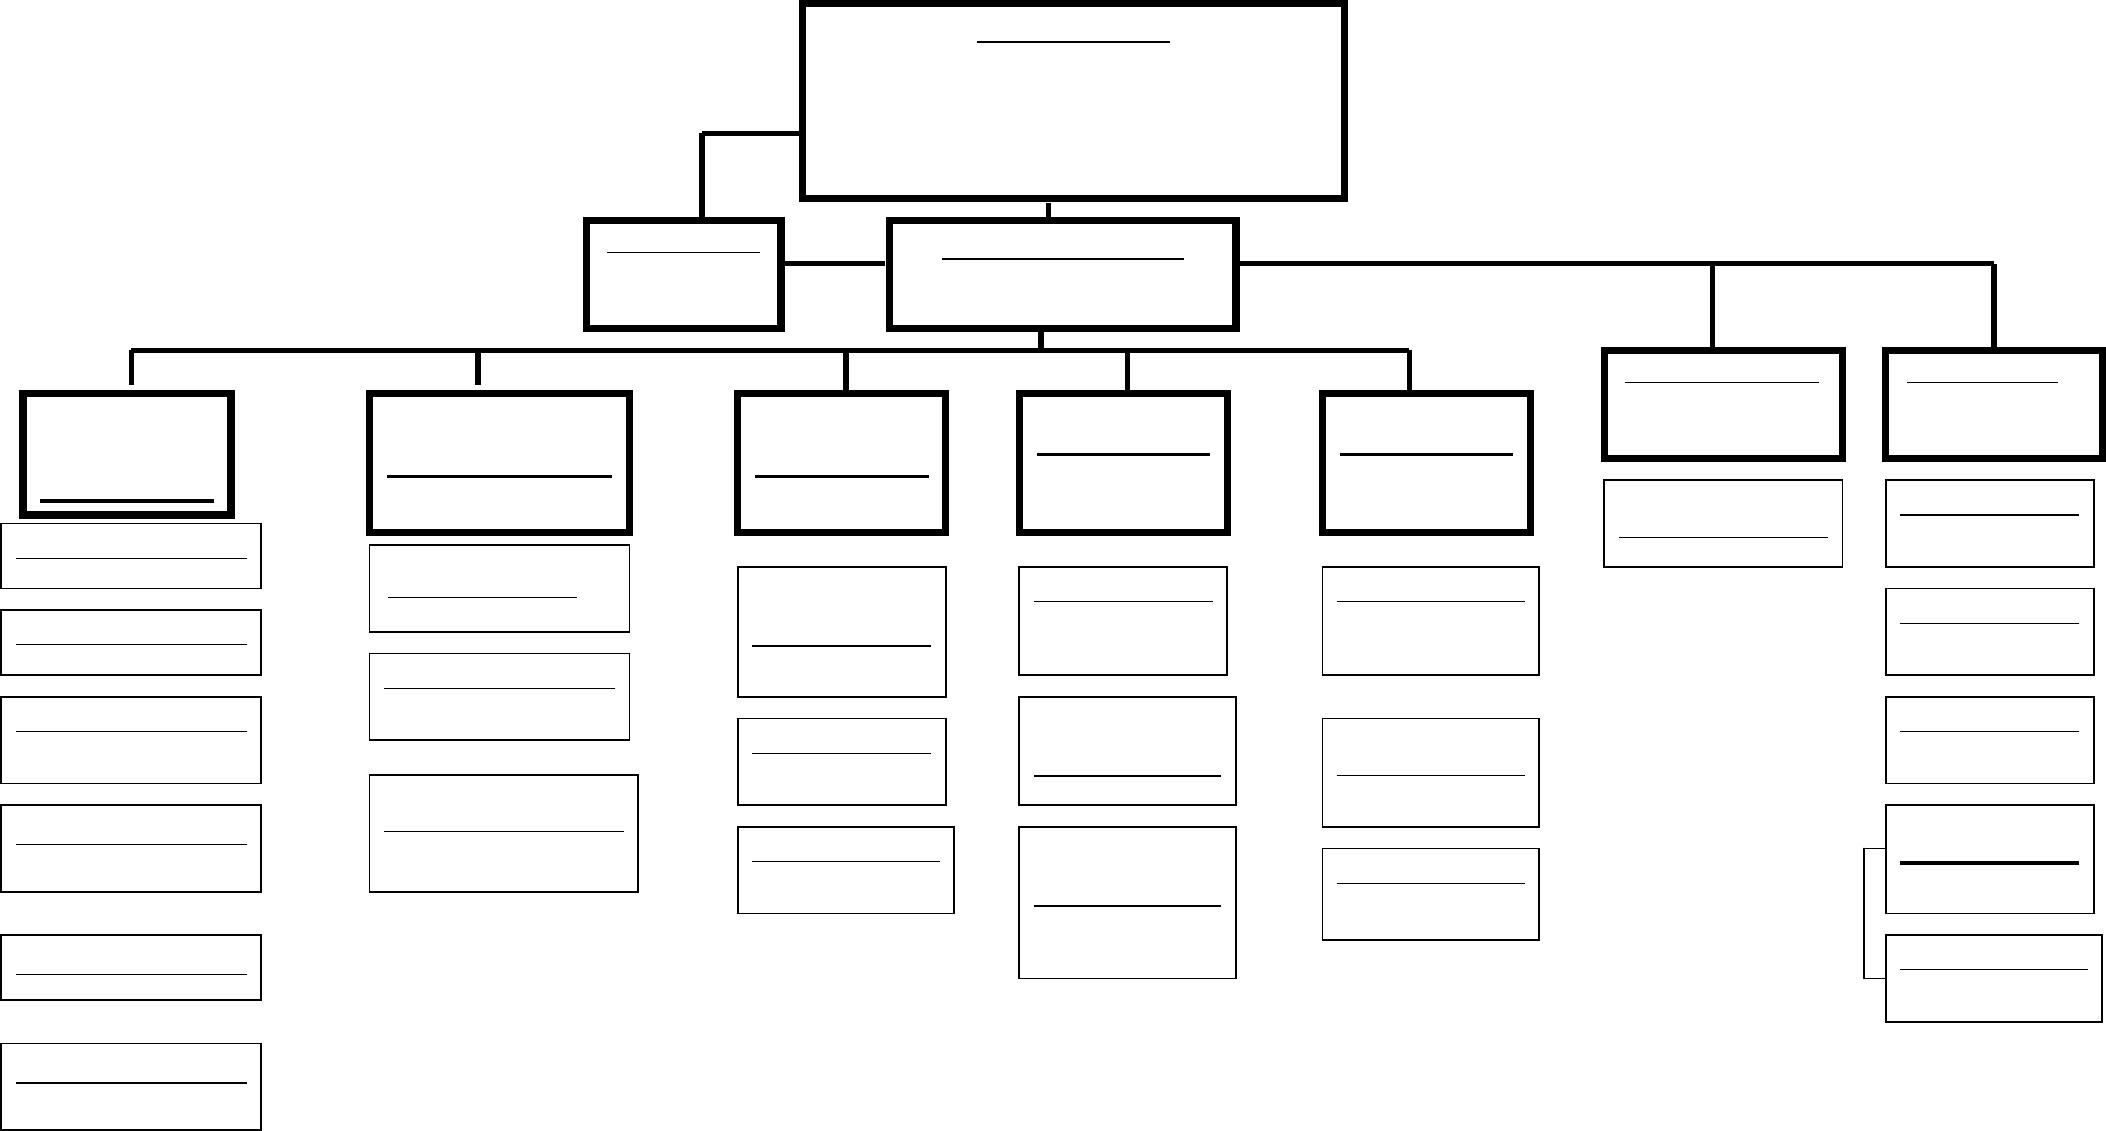 Blank Organizational Chart - Cumberland College Free Download Inside Free Blank Organizational Chart Template